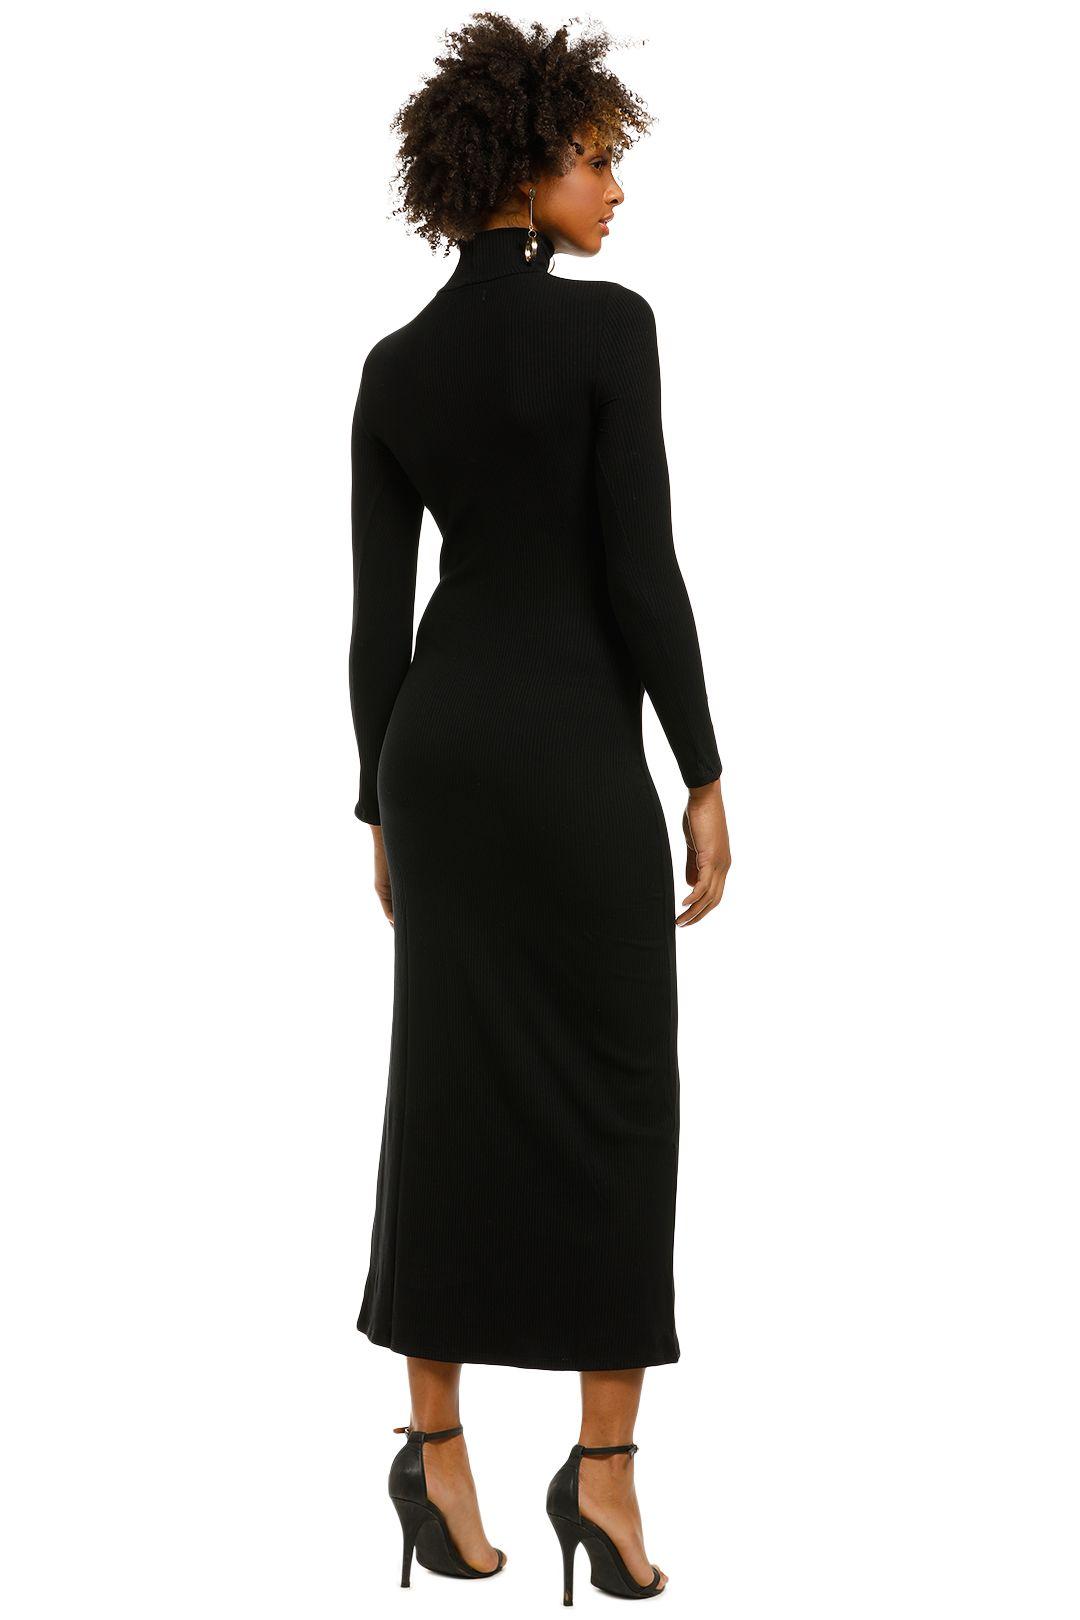 Flynn-Skye-Marie-Midi-Dress-Black-Ribbed-Back